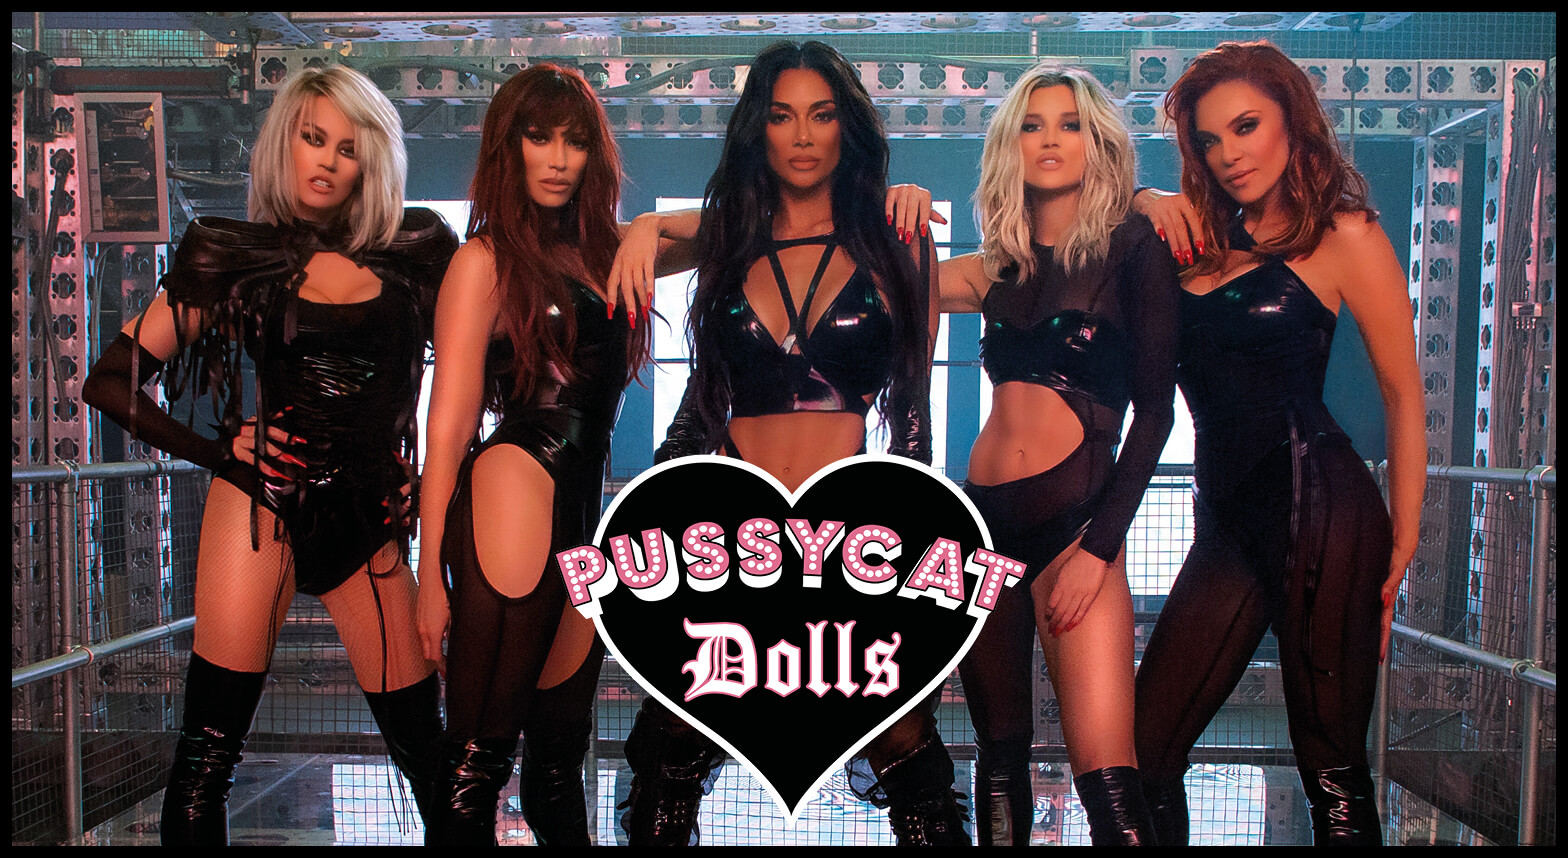 pussycat-dolls-arenasV1.jpg